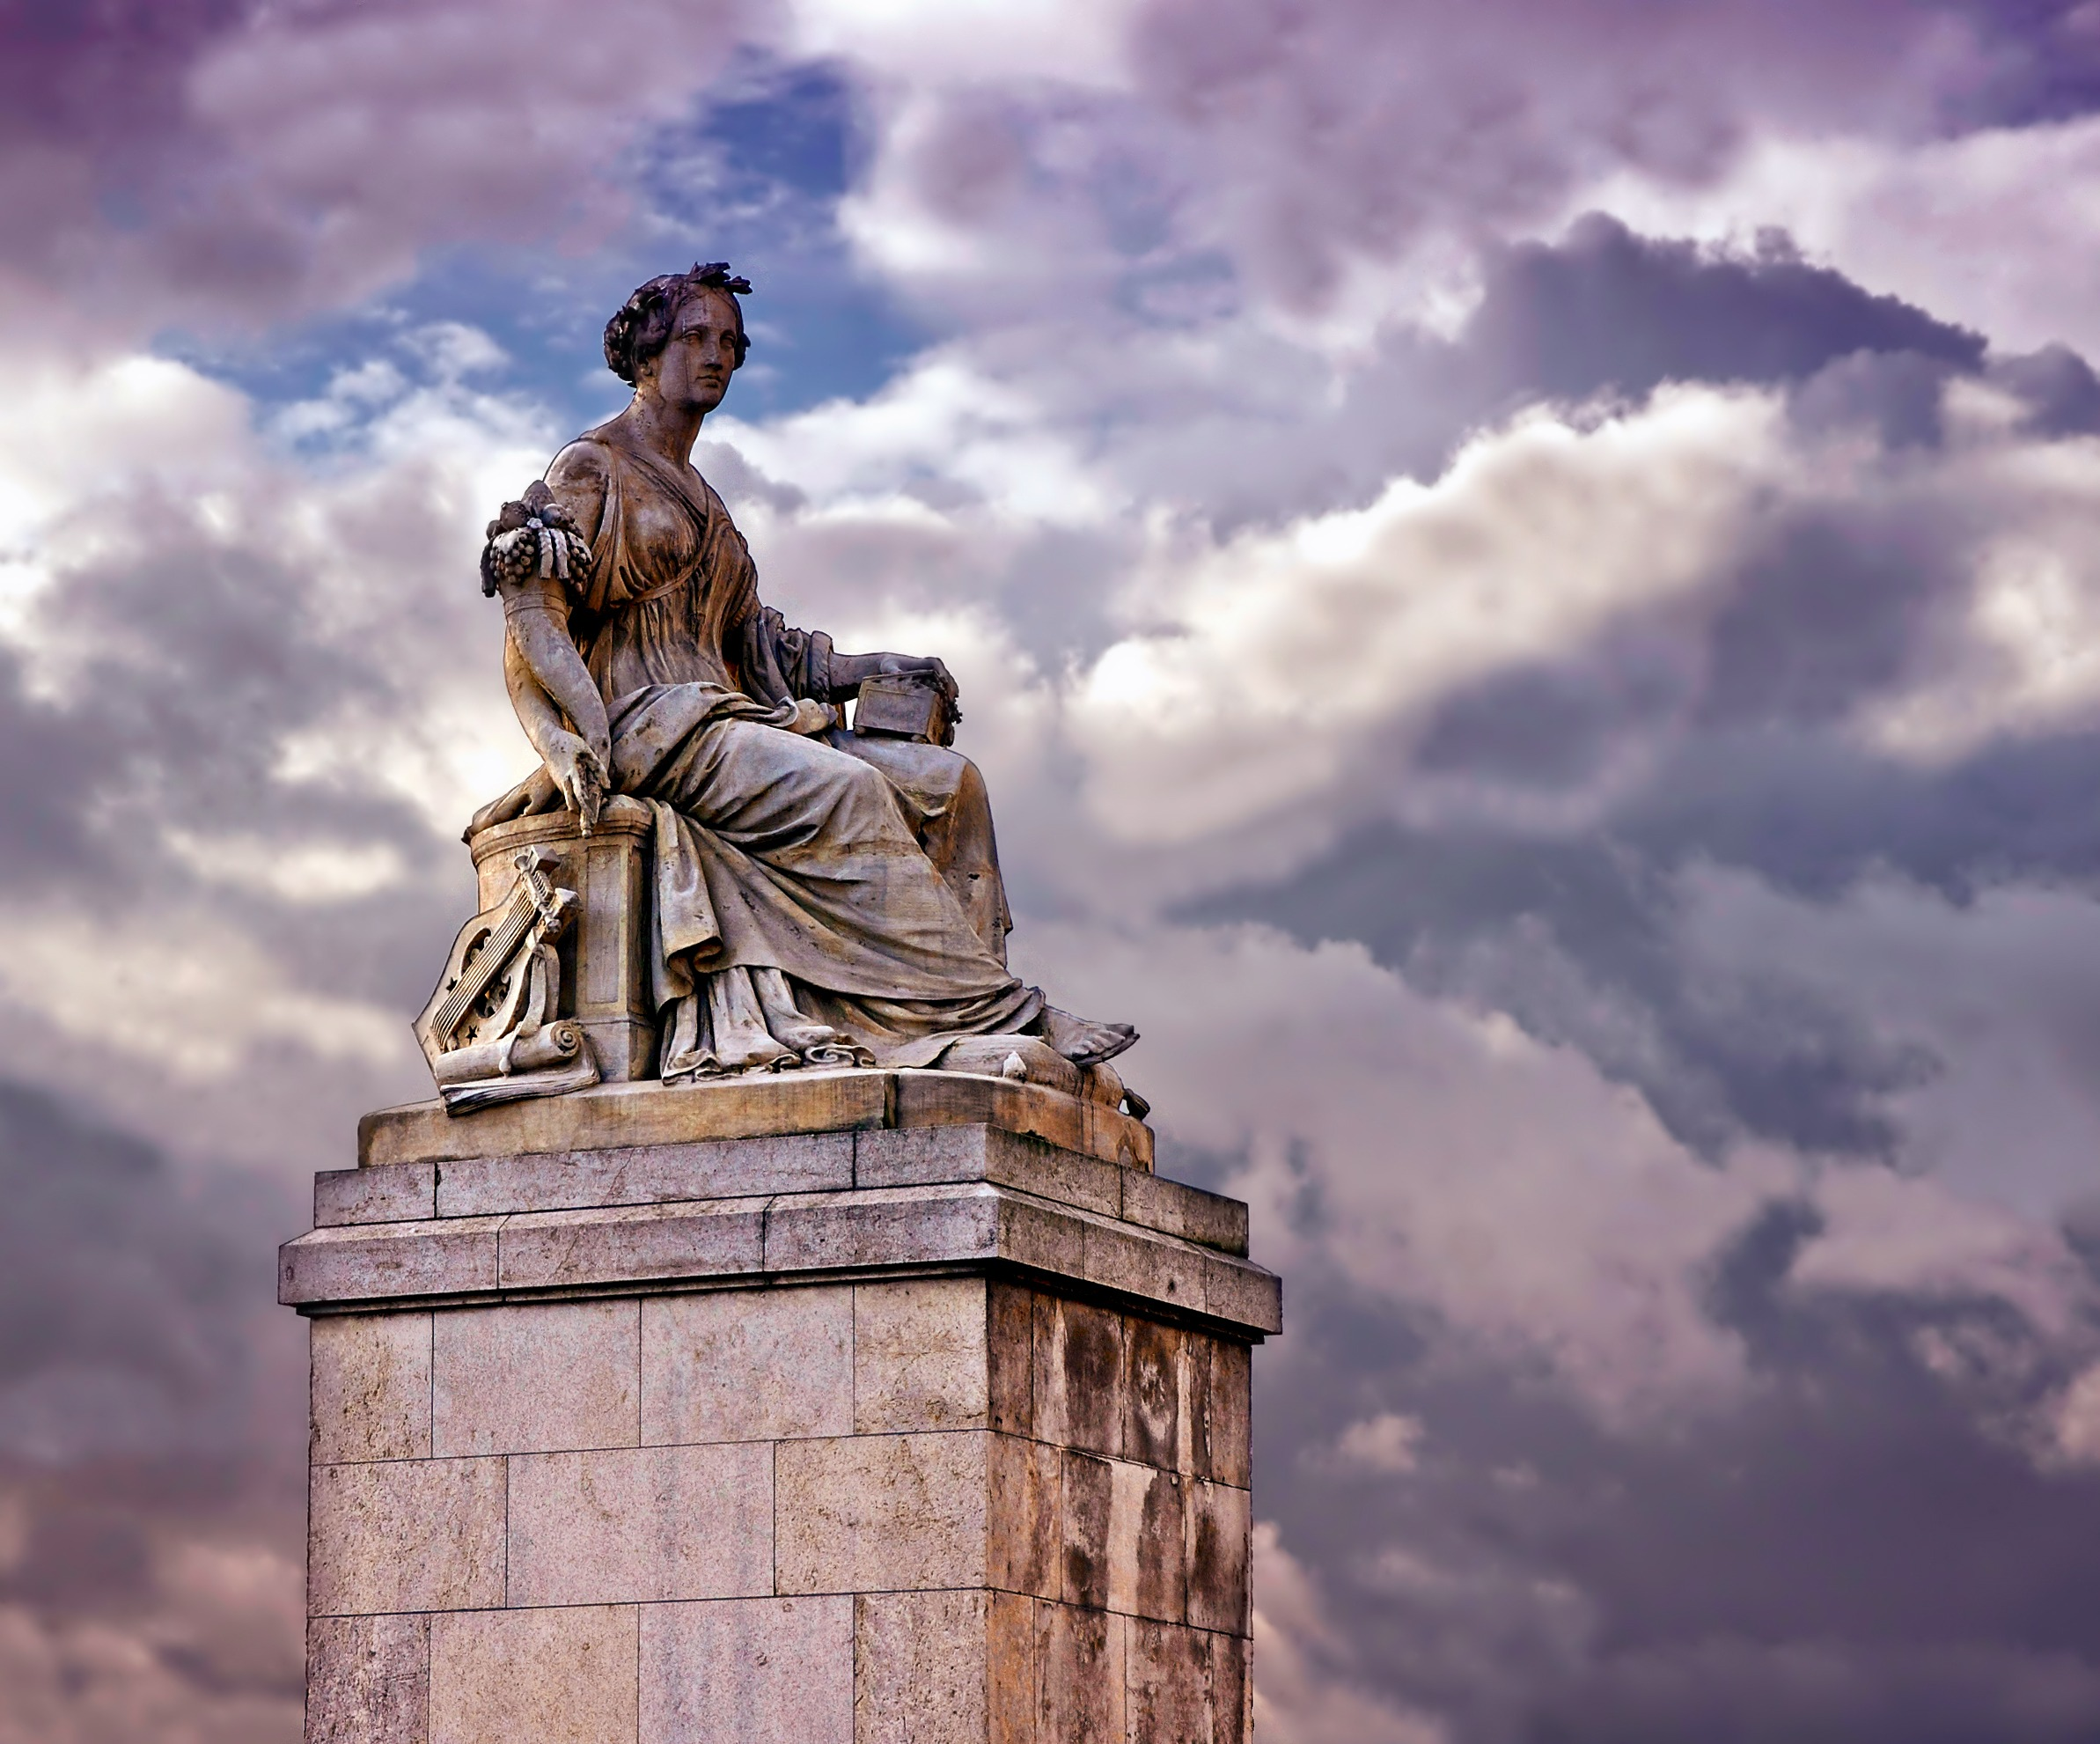 Sculpture in Paris, Statue, Sculpture, Paris, Carved, HQ Photo